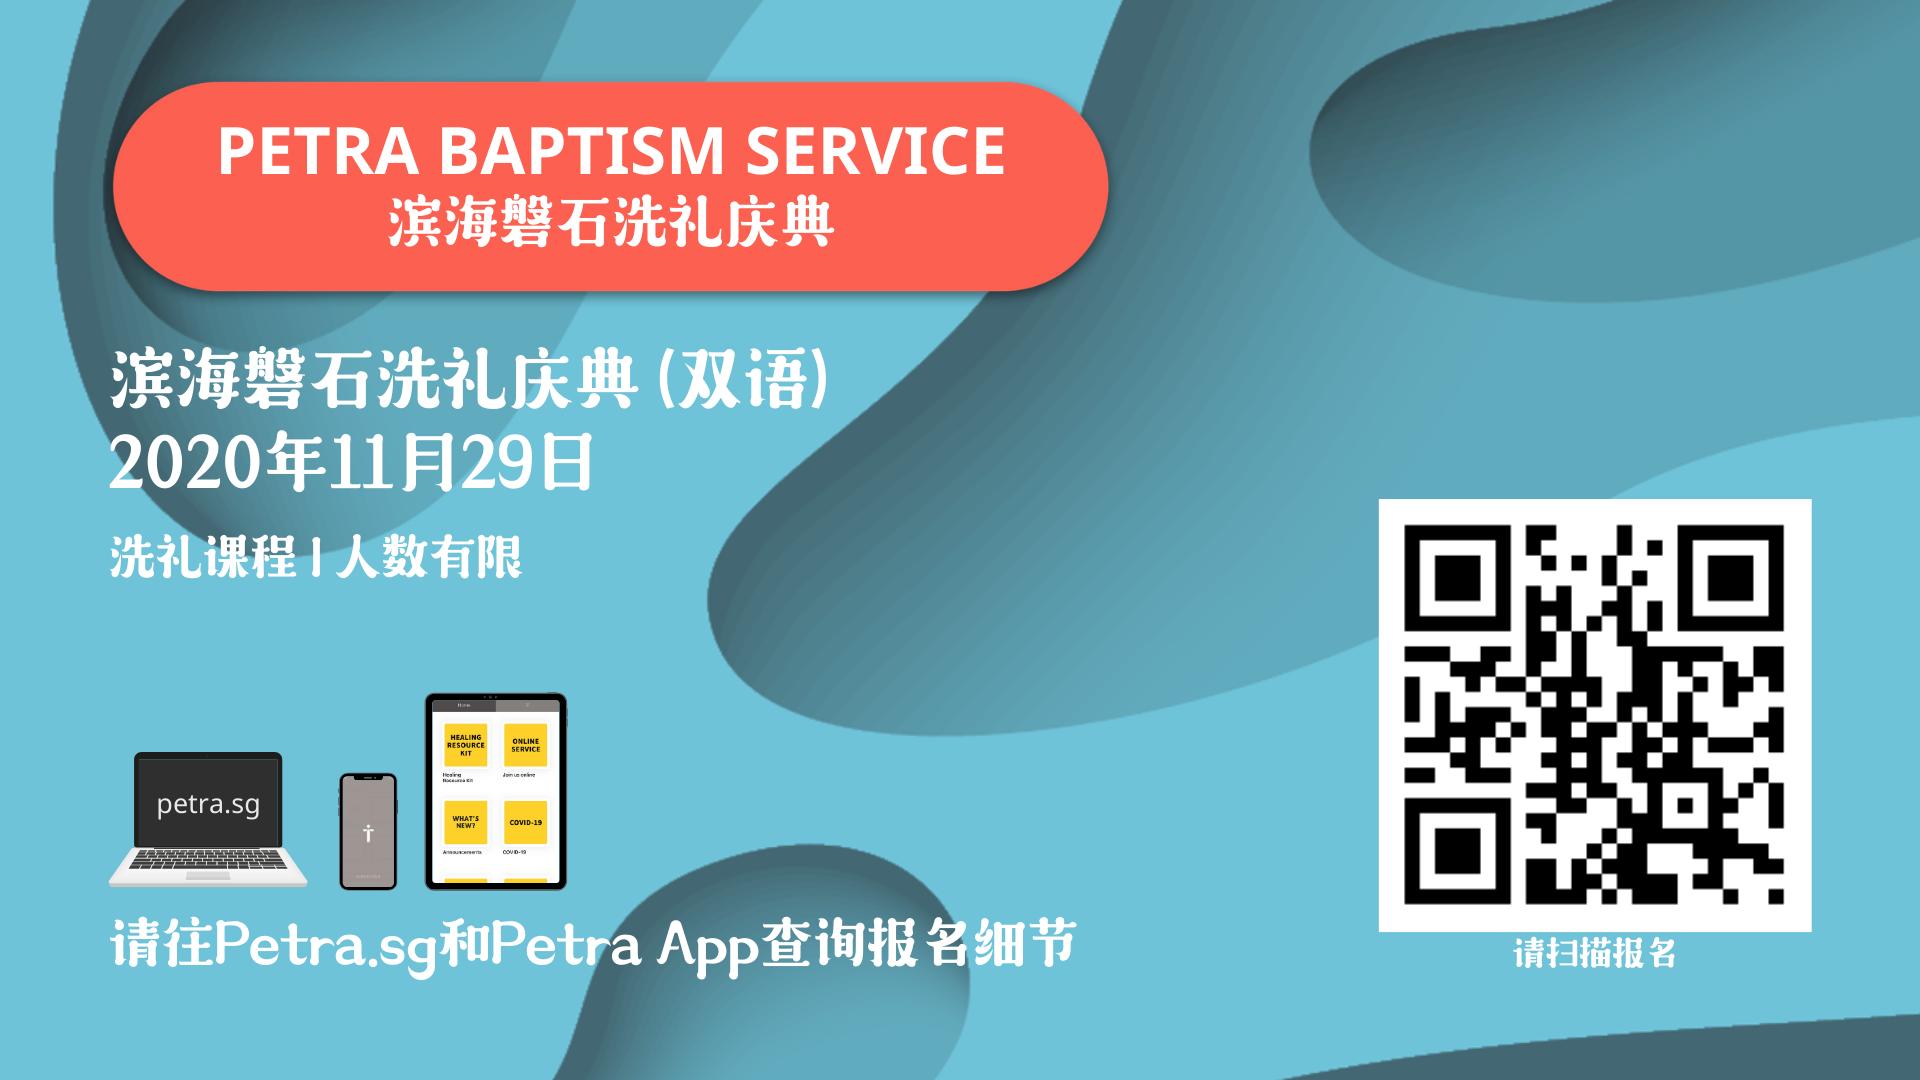 7_Baptism Annc CHI